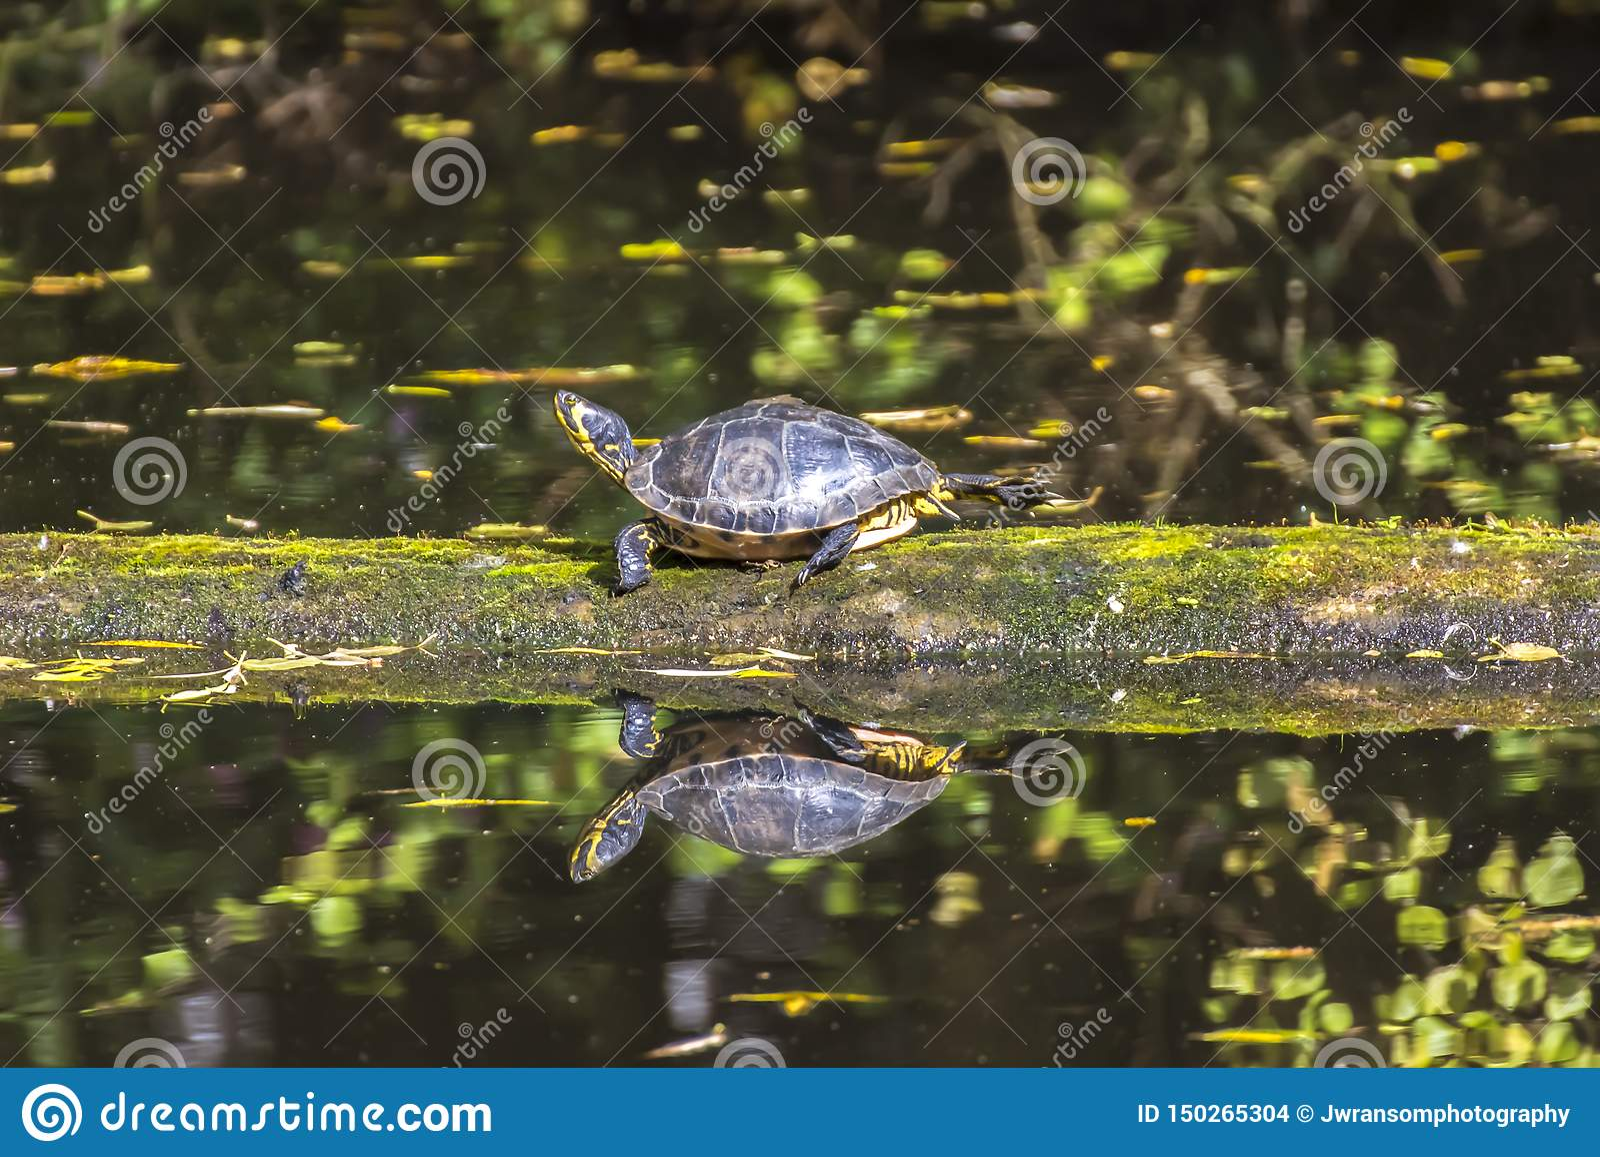 Tortuga hinchada amarilla que camina en un registro que flota en agua